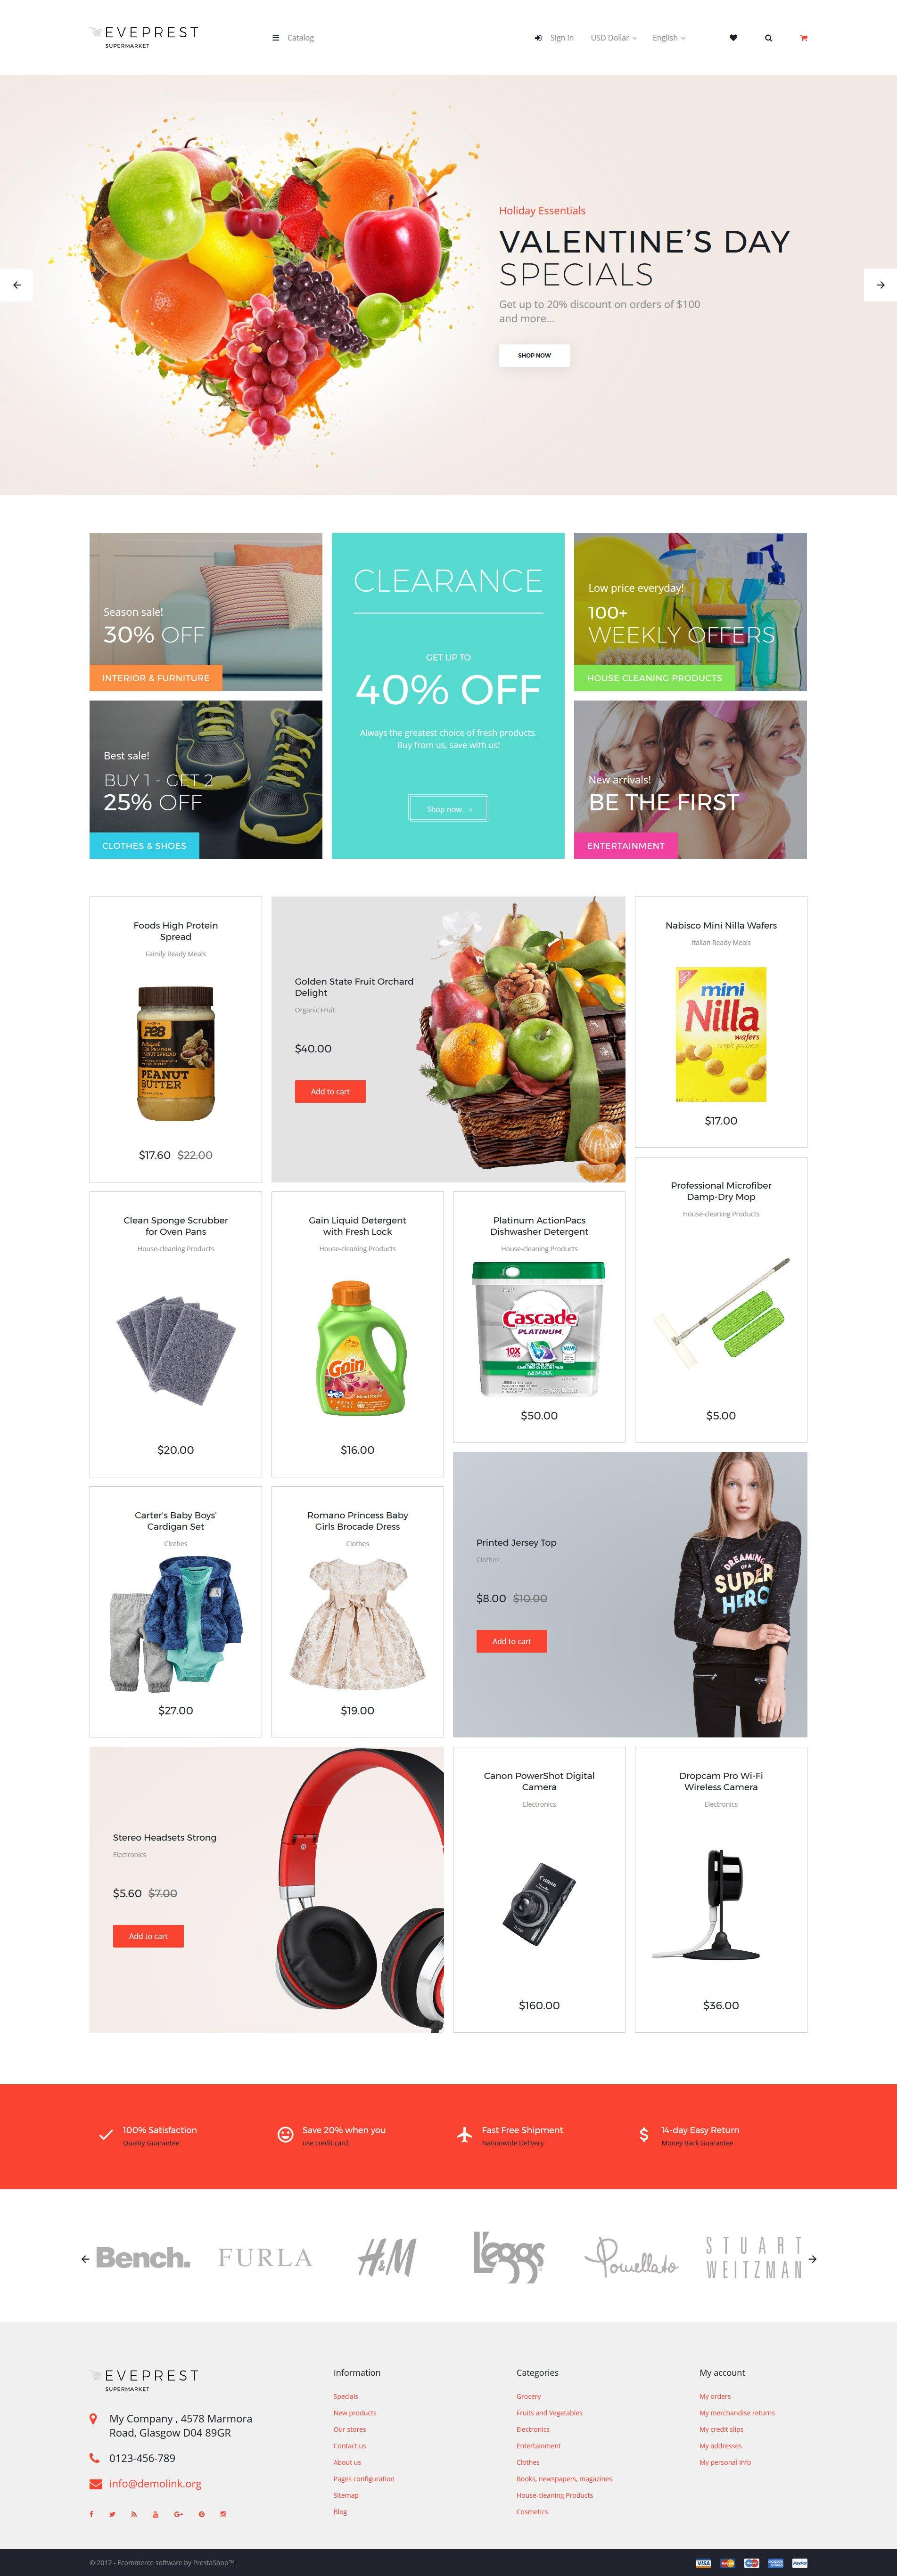 Eveprest - Supermarket №62387 - скриншот